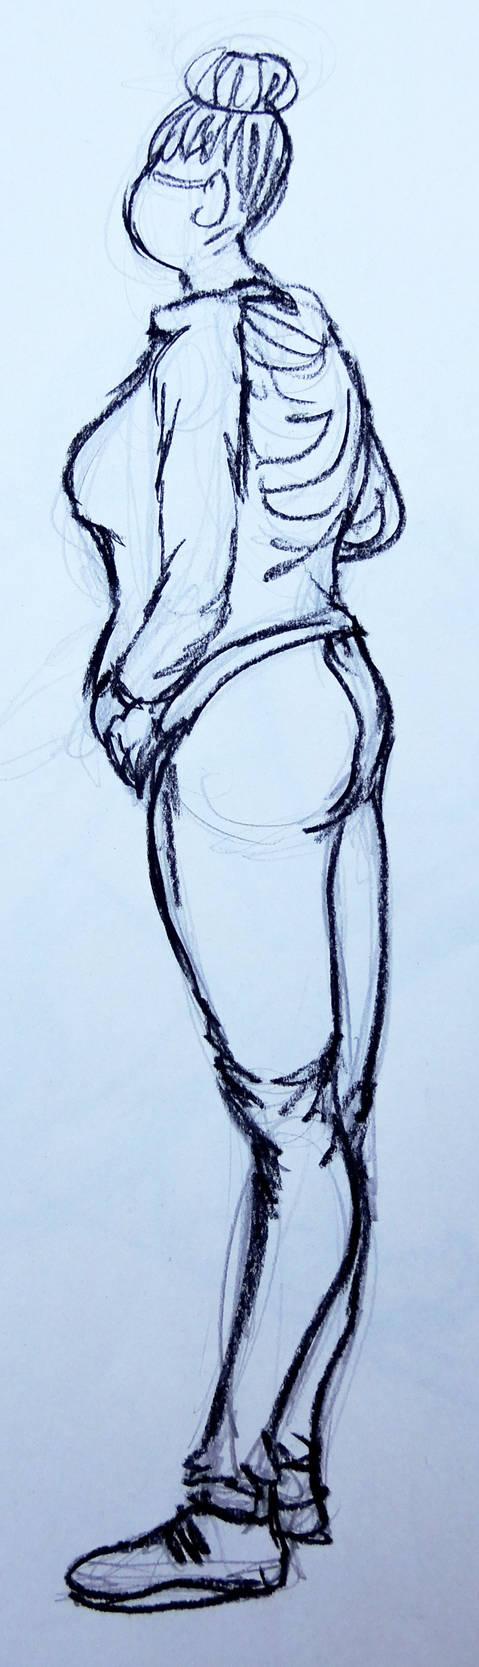 ART20: Gesture 05